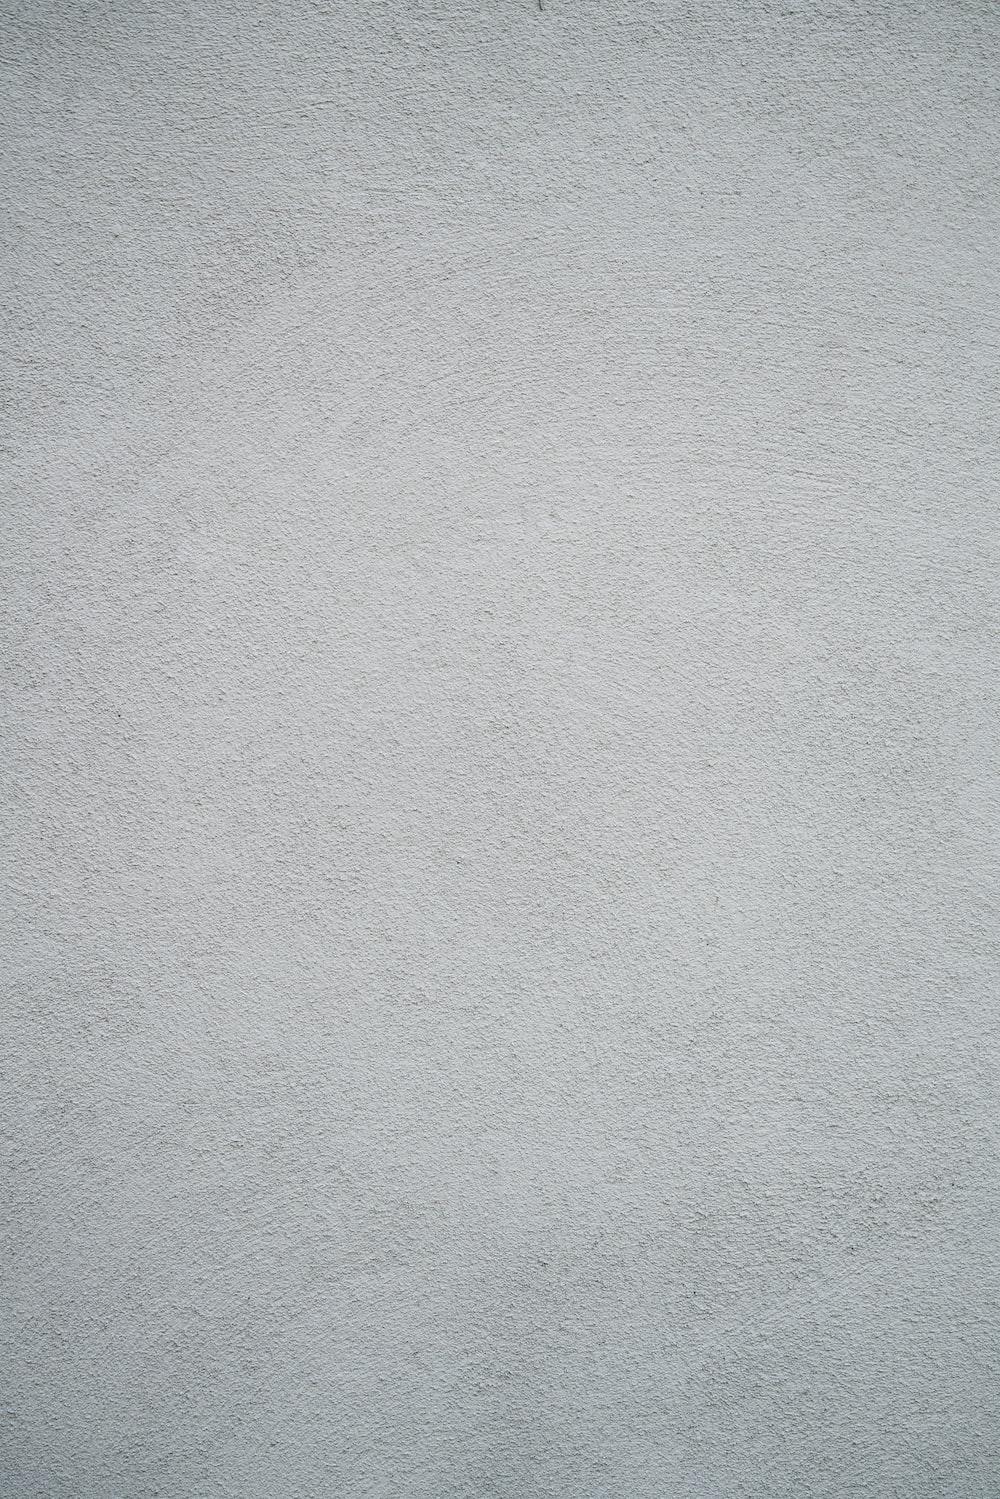 Textured Wallpapers Free Hd Download 500 Hq Unsplash